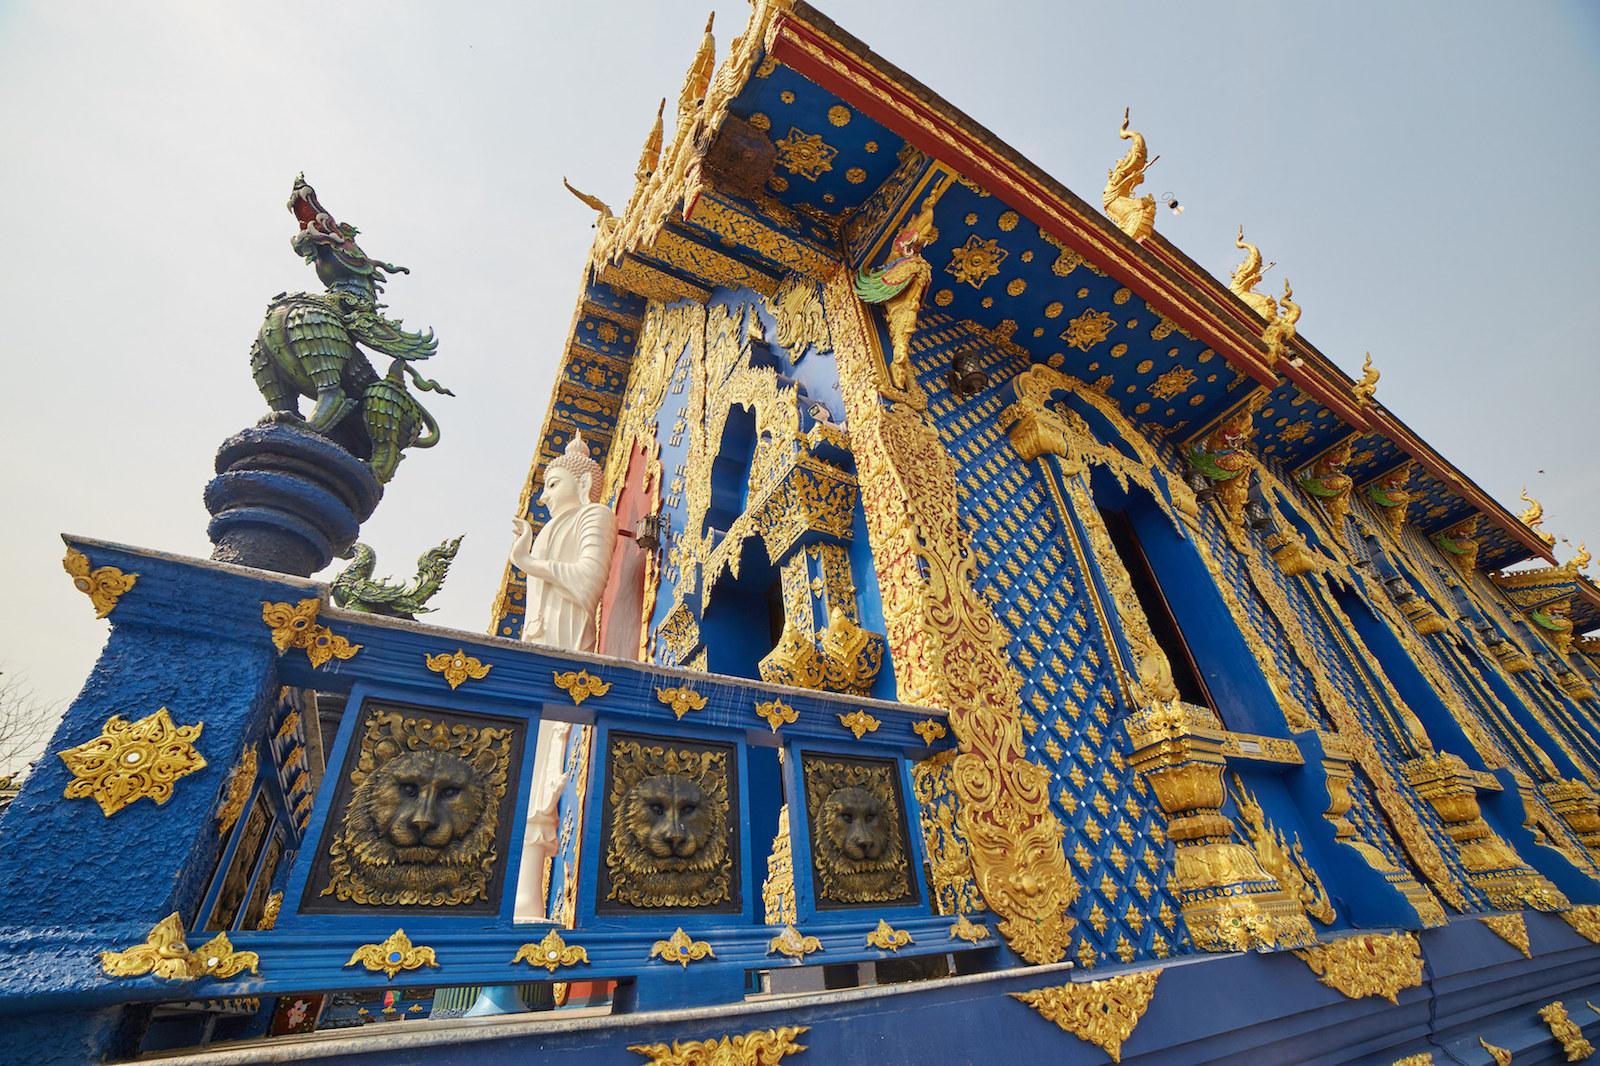 Chiang Rai Blue Temple